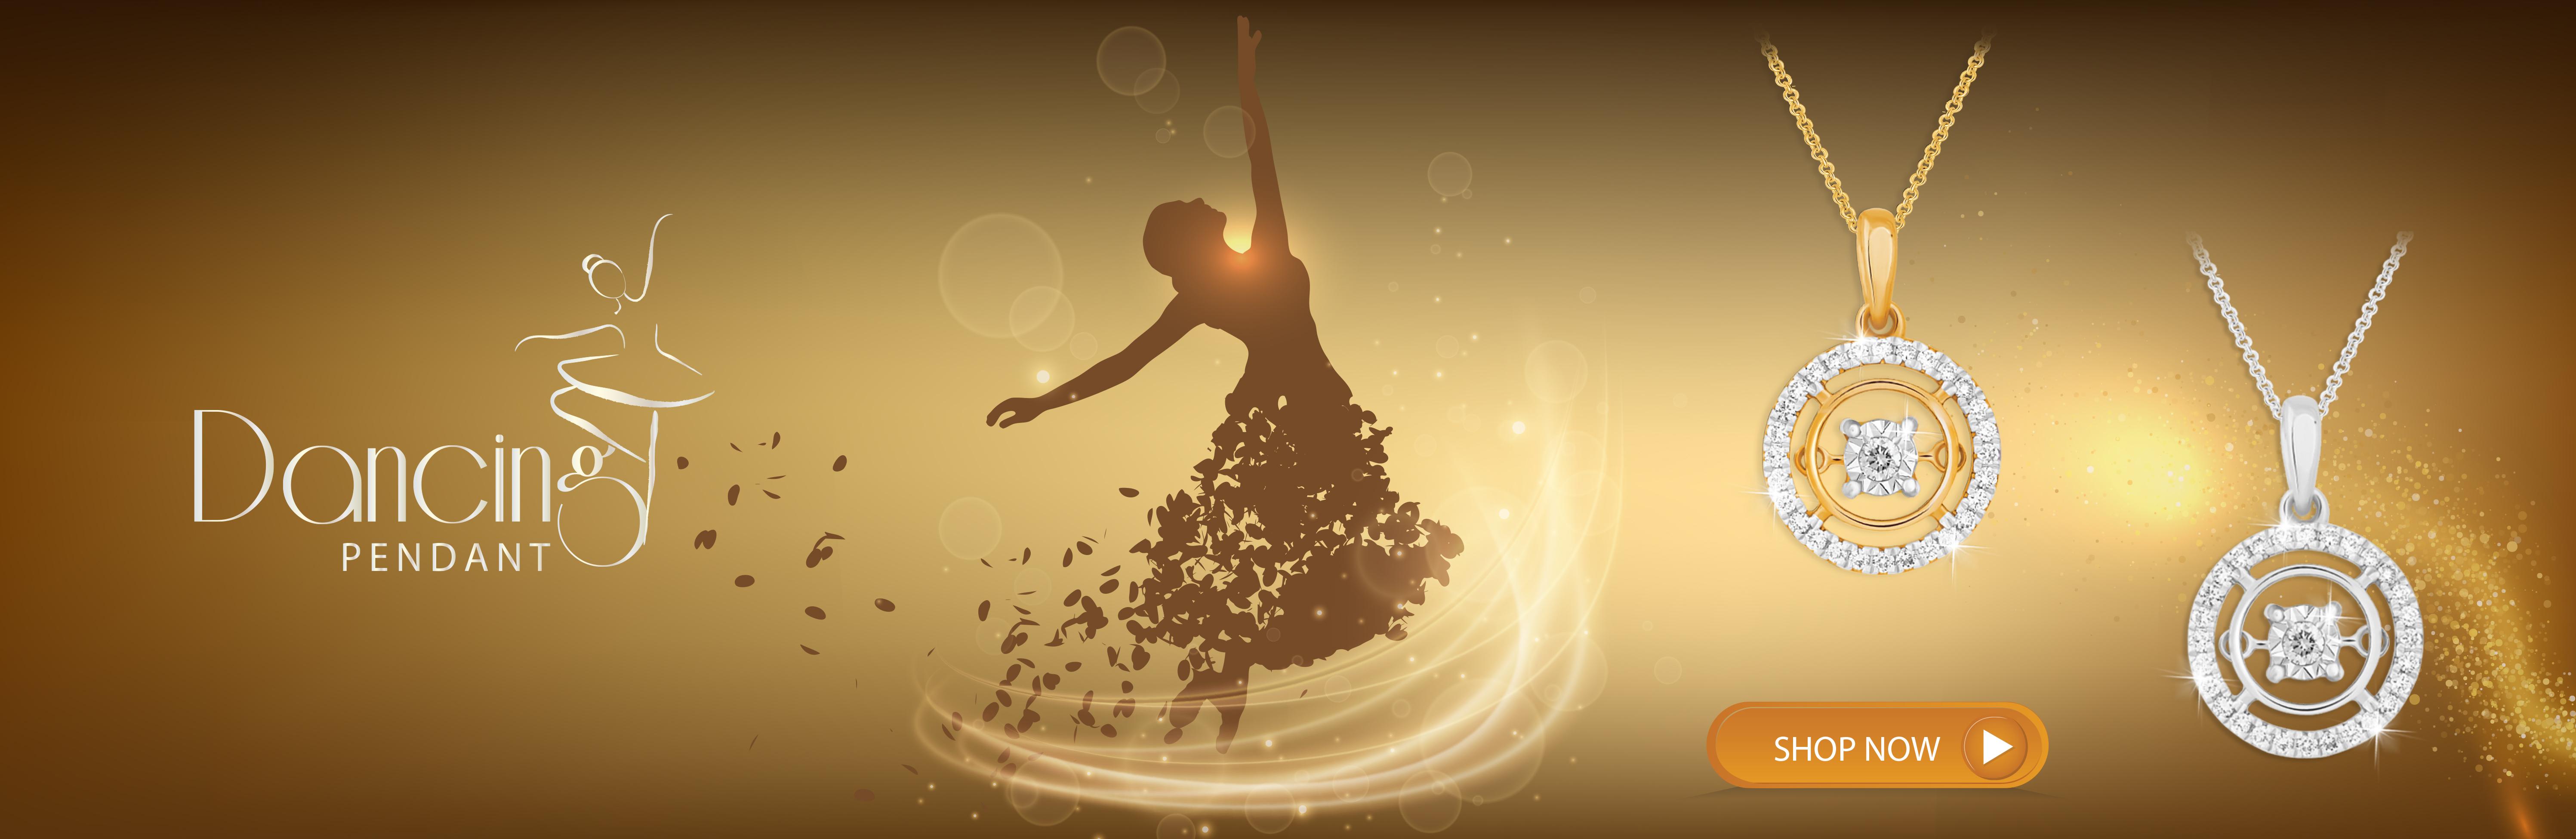 Dancing Pendants